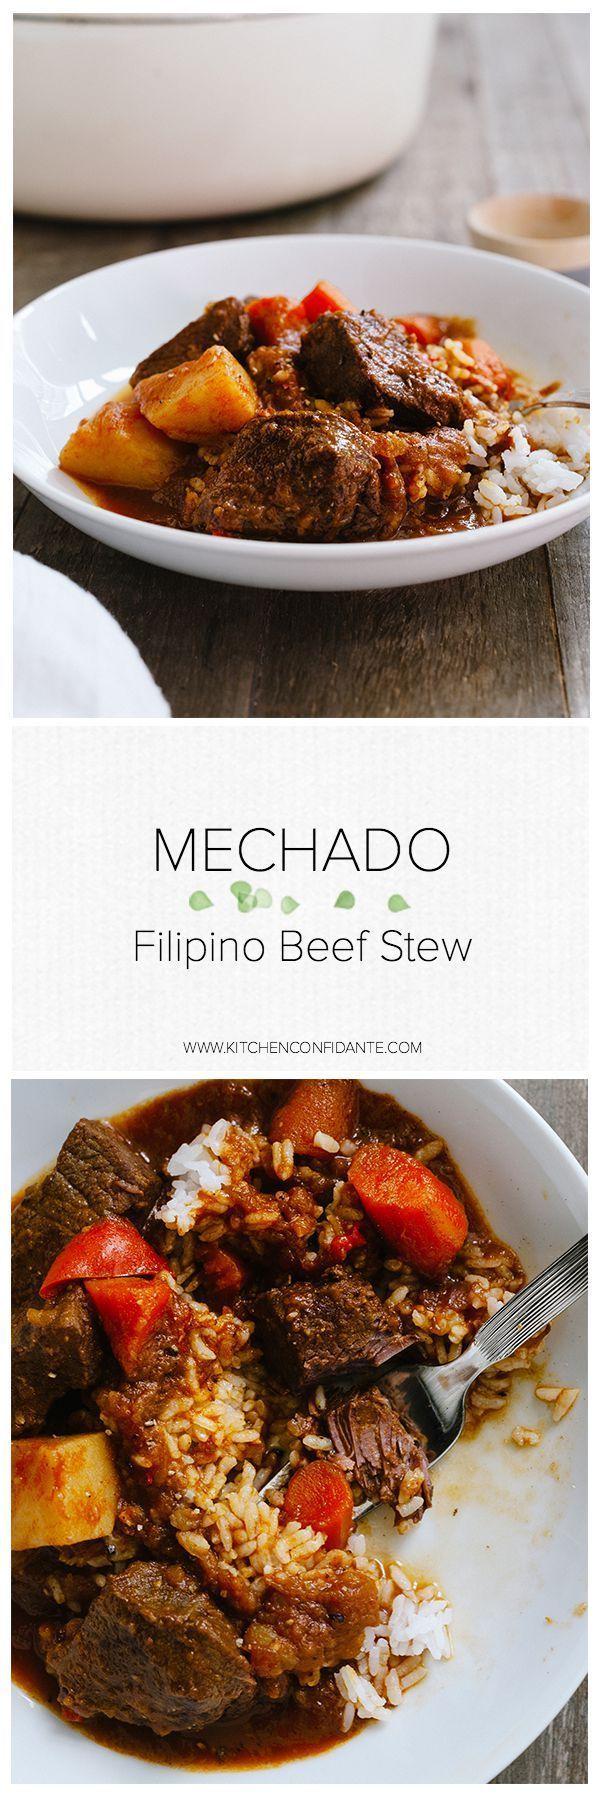 Mechado Filipino Beef Stew | Recipe | Filipino beef stew ...